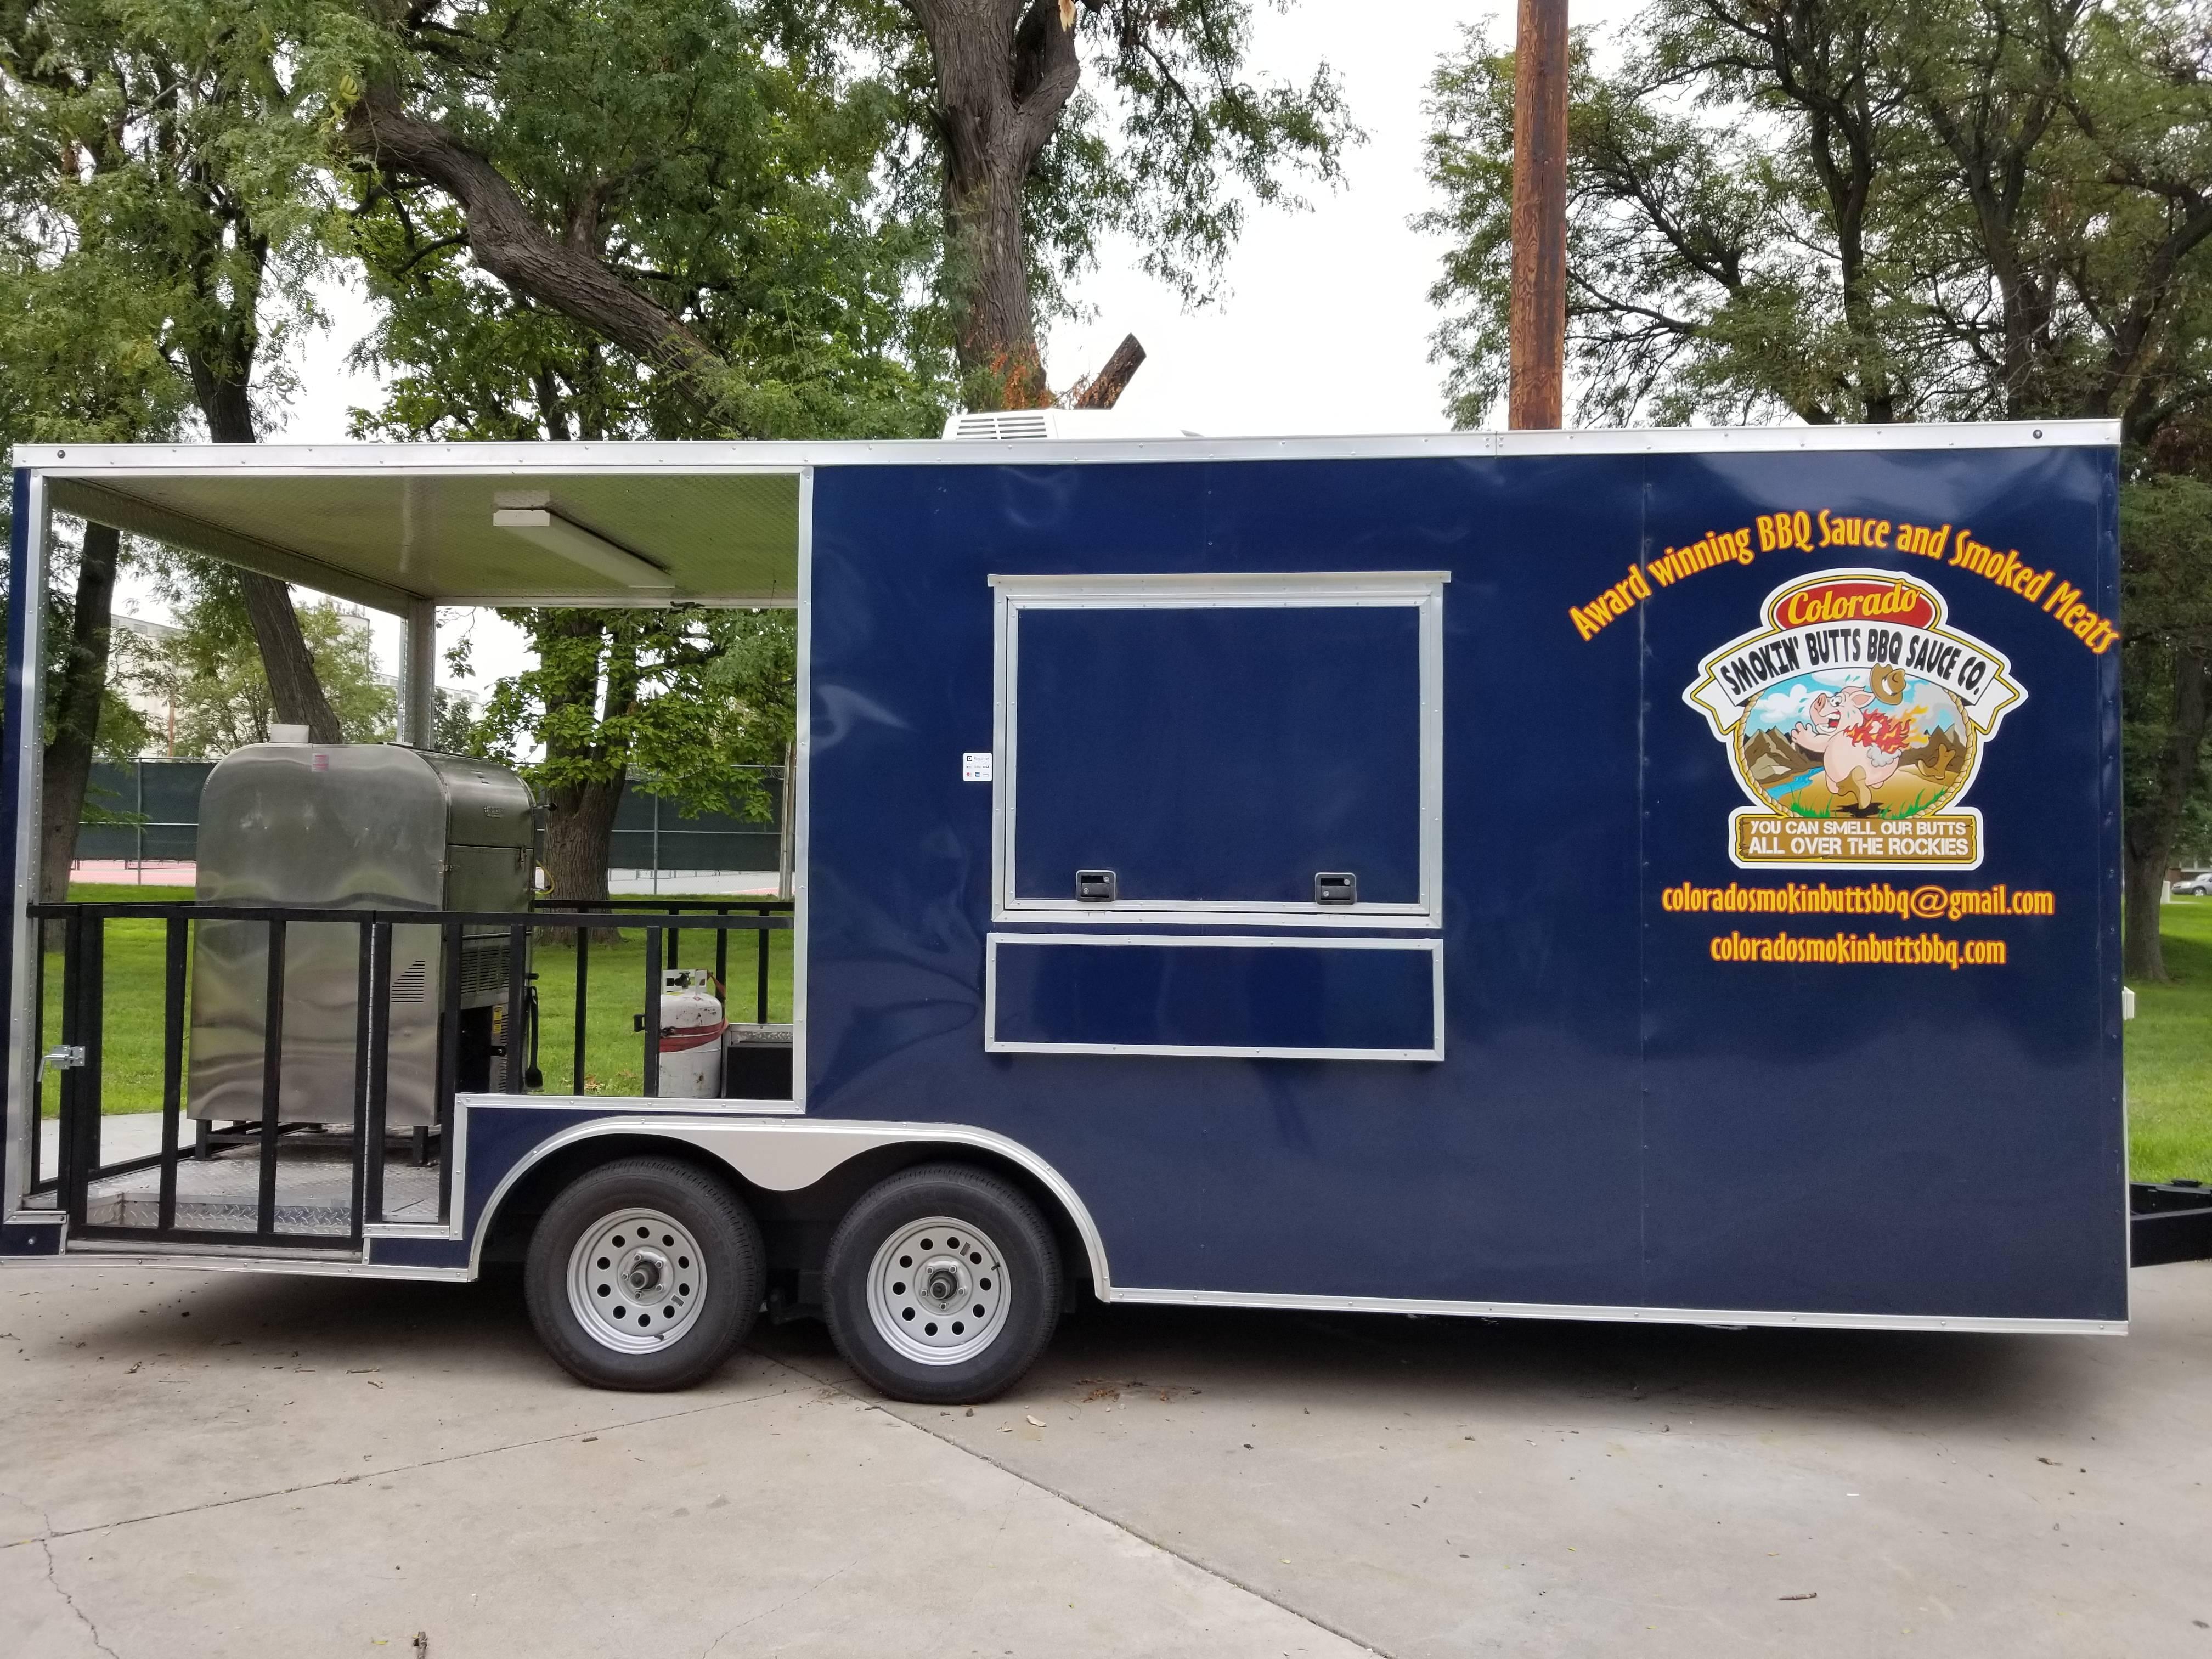 Colorado Smokin' Butts Concession Trailer